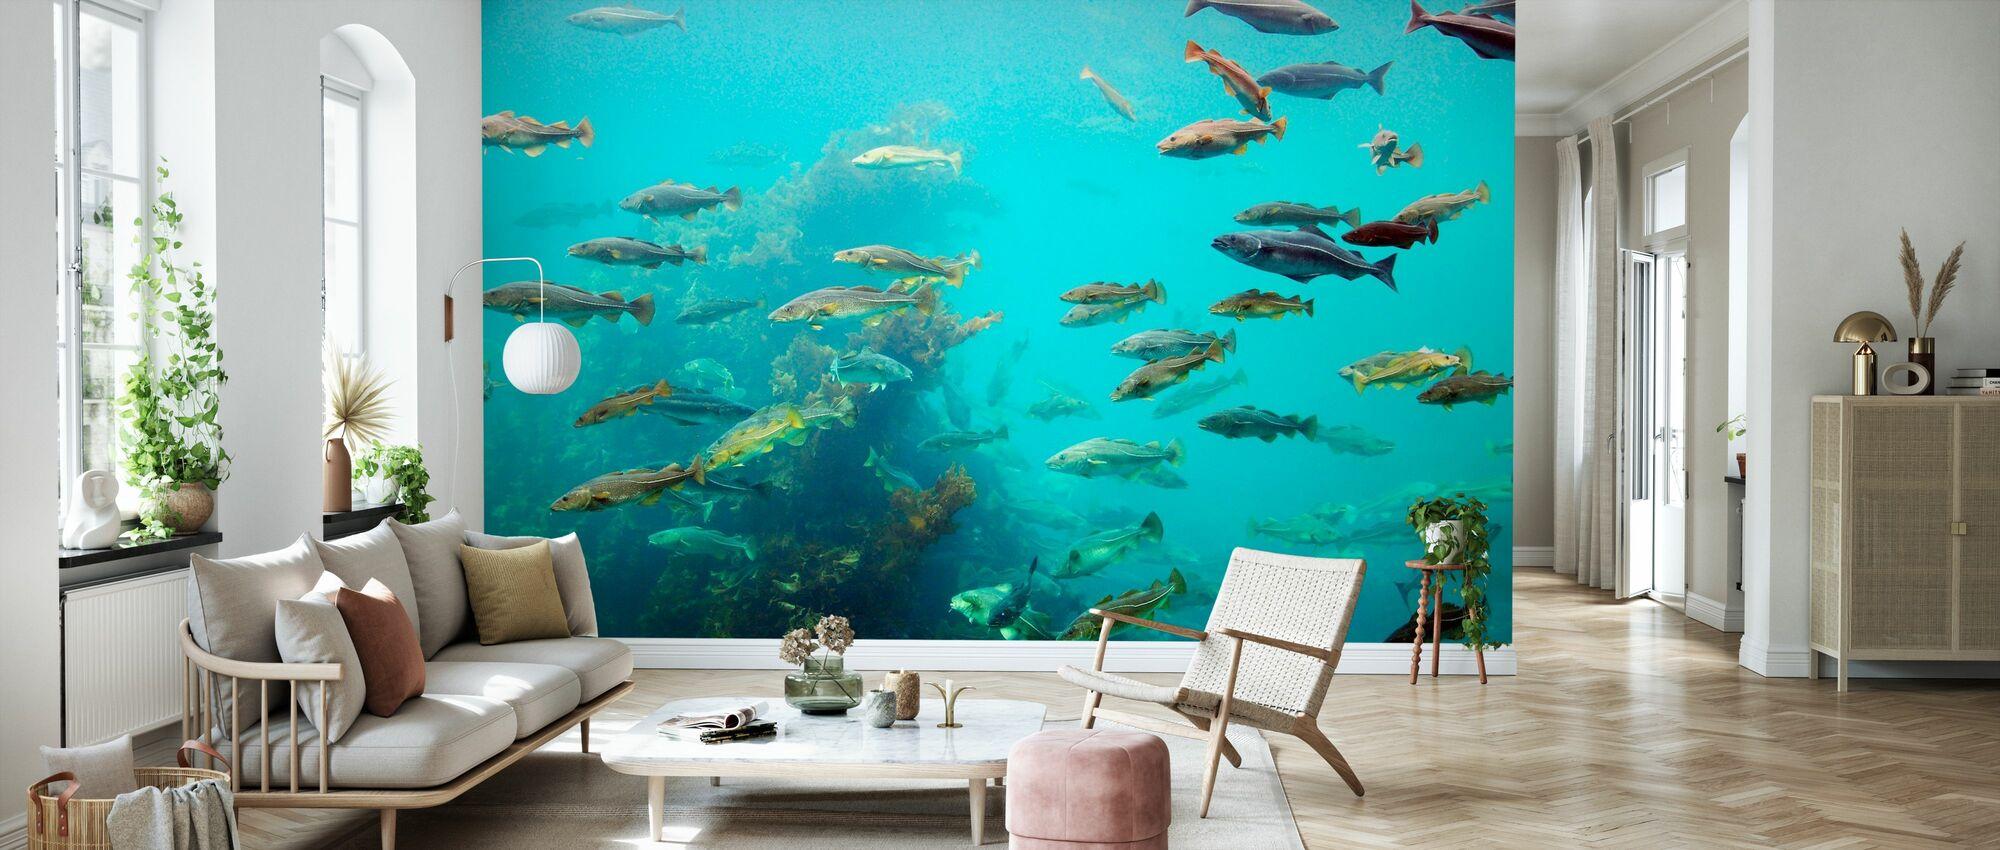 Circling Fish - Wallpaper - Living Room